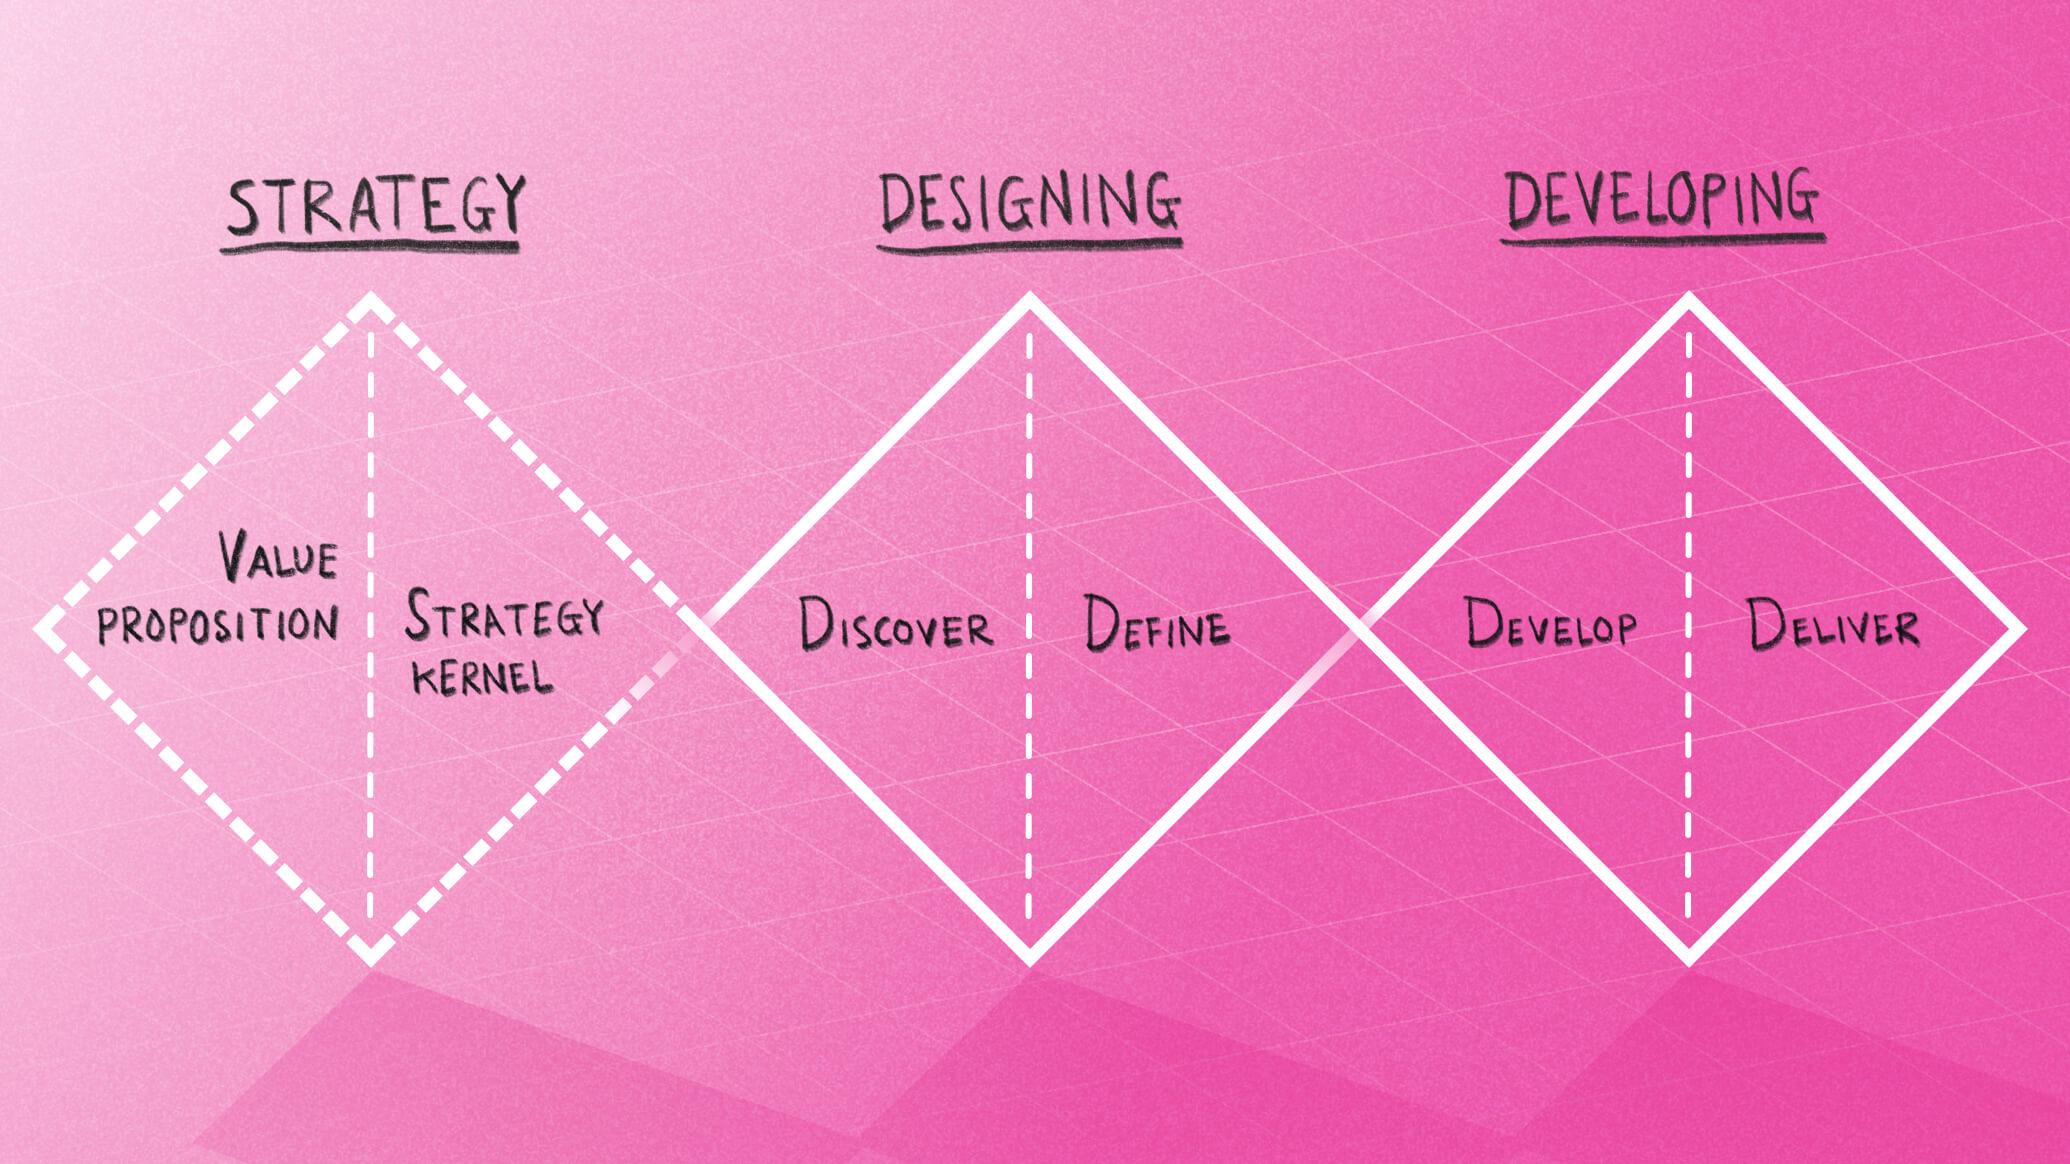 Nomensa triple diamond - Strategy, Designing, Developing